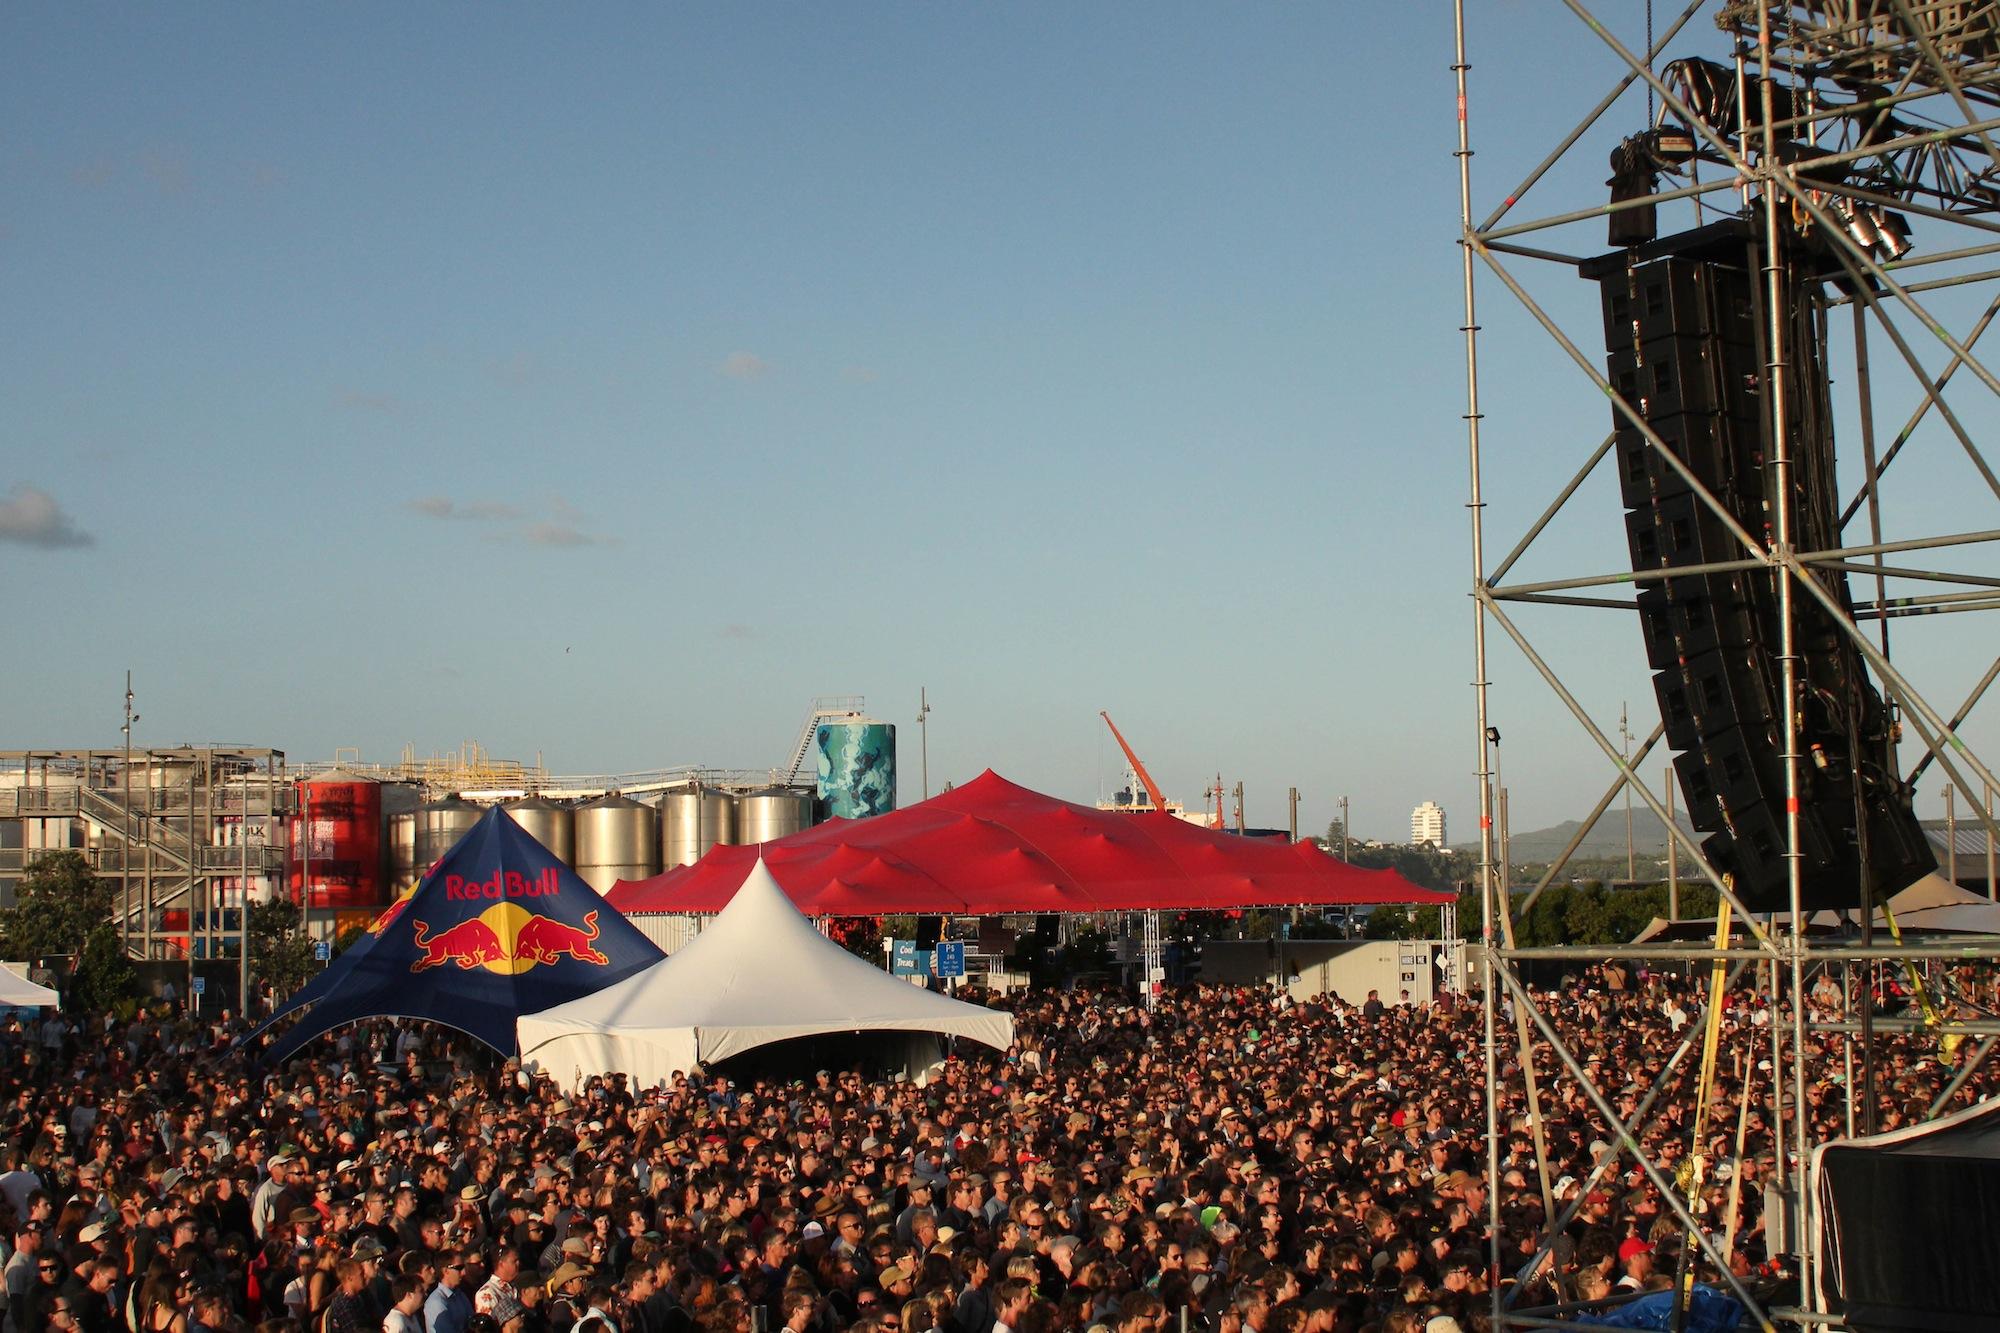 Laneway Festival Auckland 2014